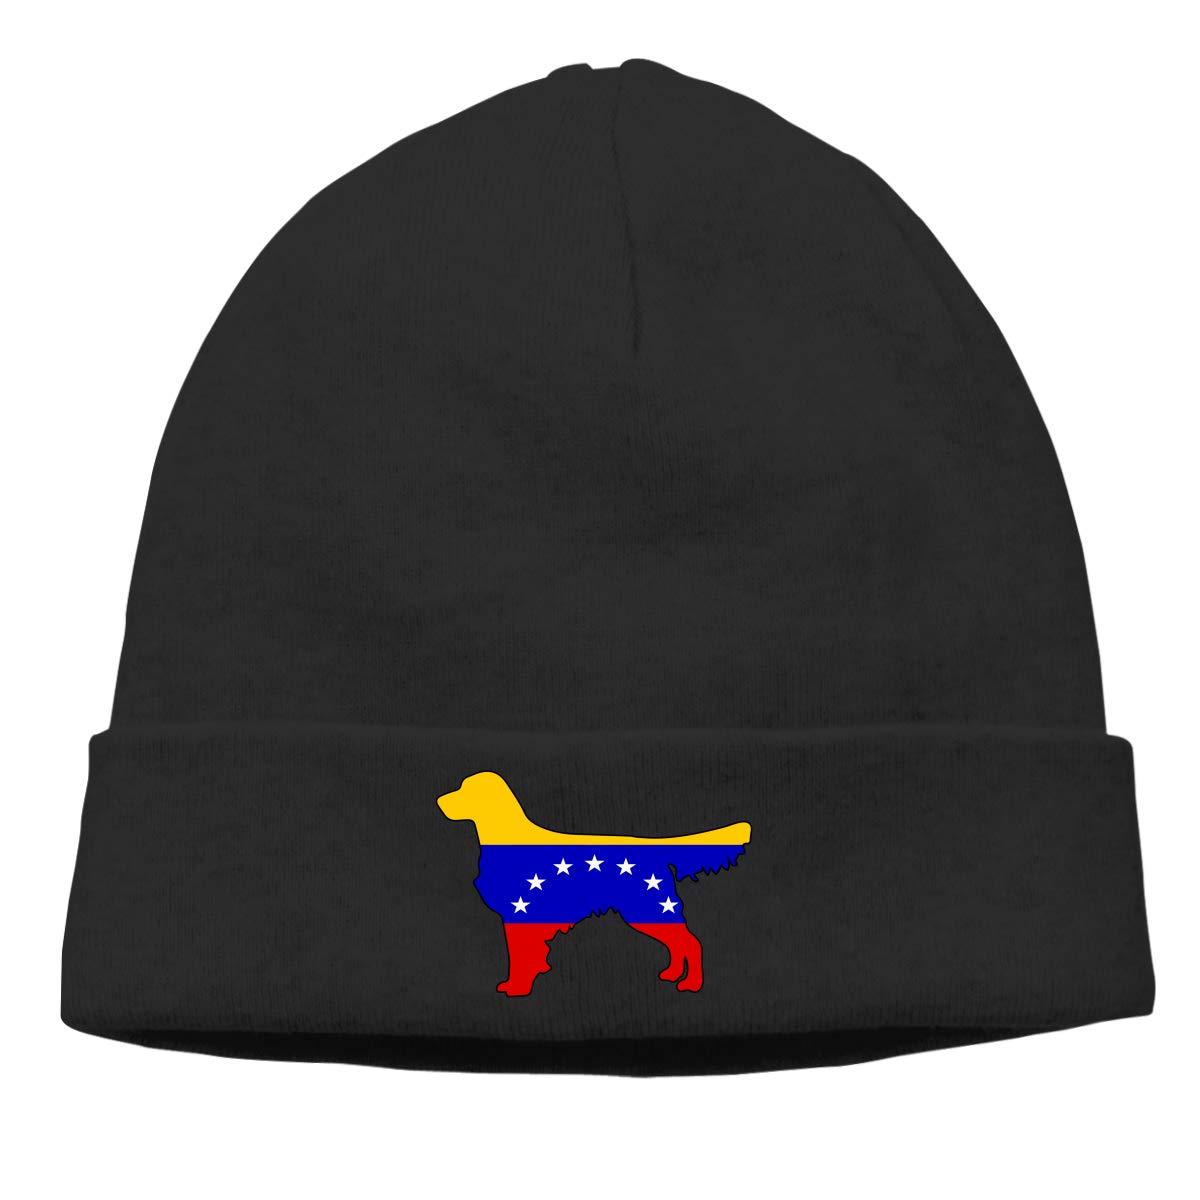 Thin Stretchy /& Soft Winter Cap Venezuela Flag Golden Retriever Dogs Men /& Women Solid Color Beanie Hat